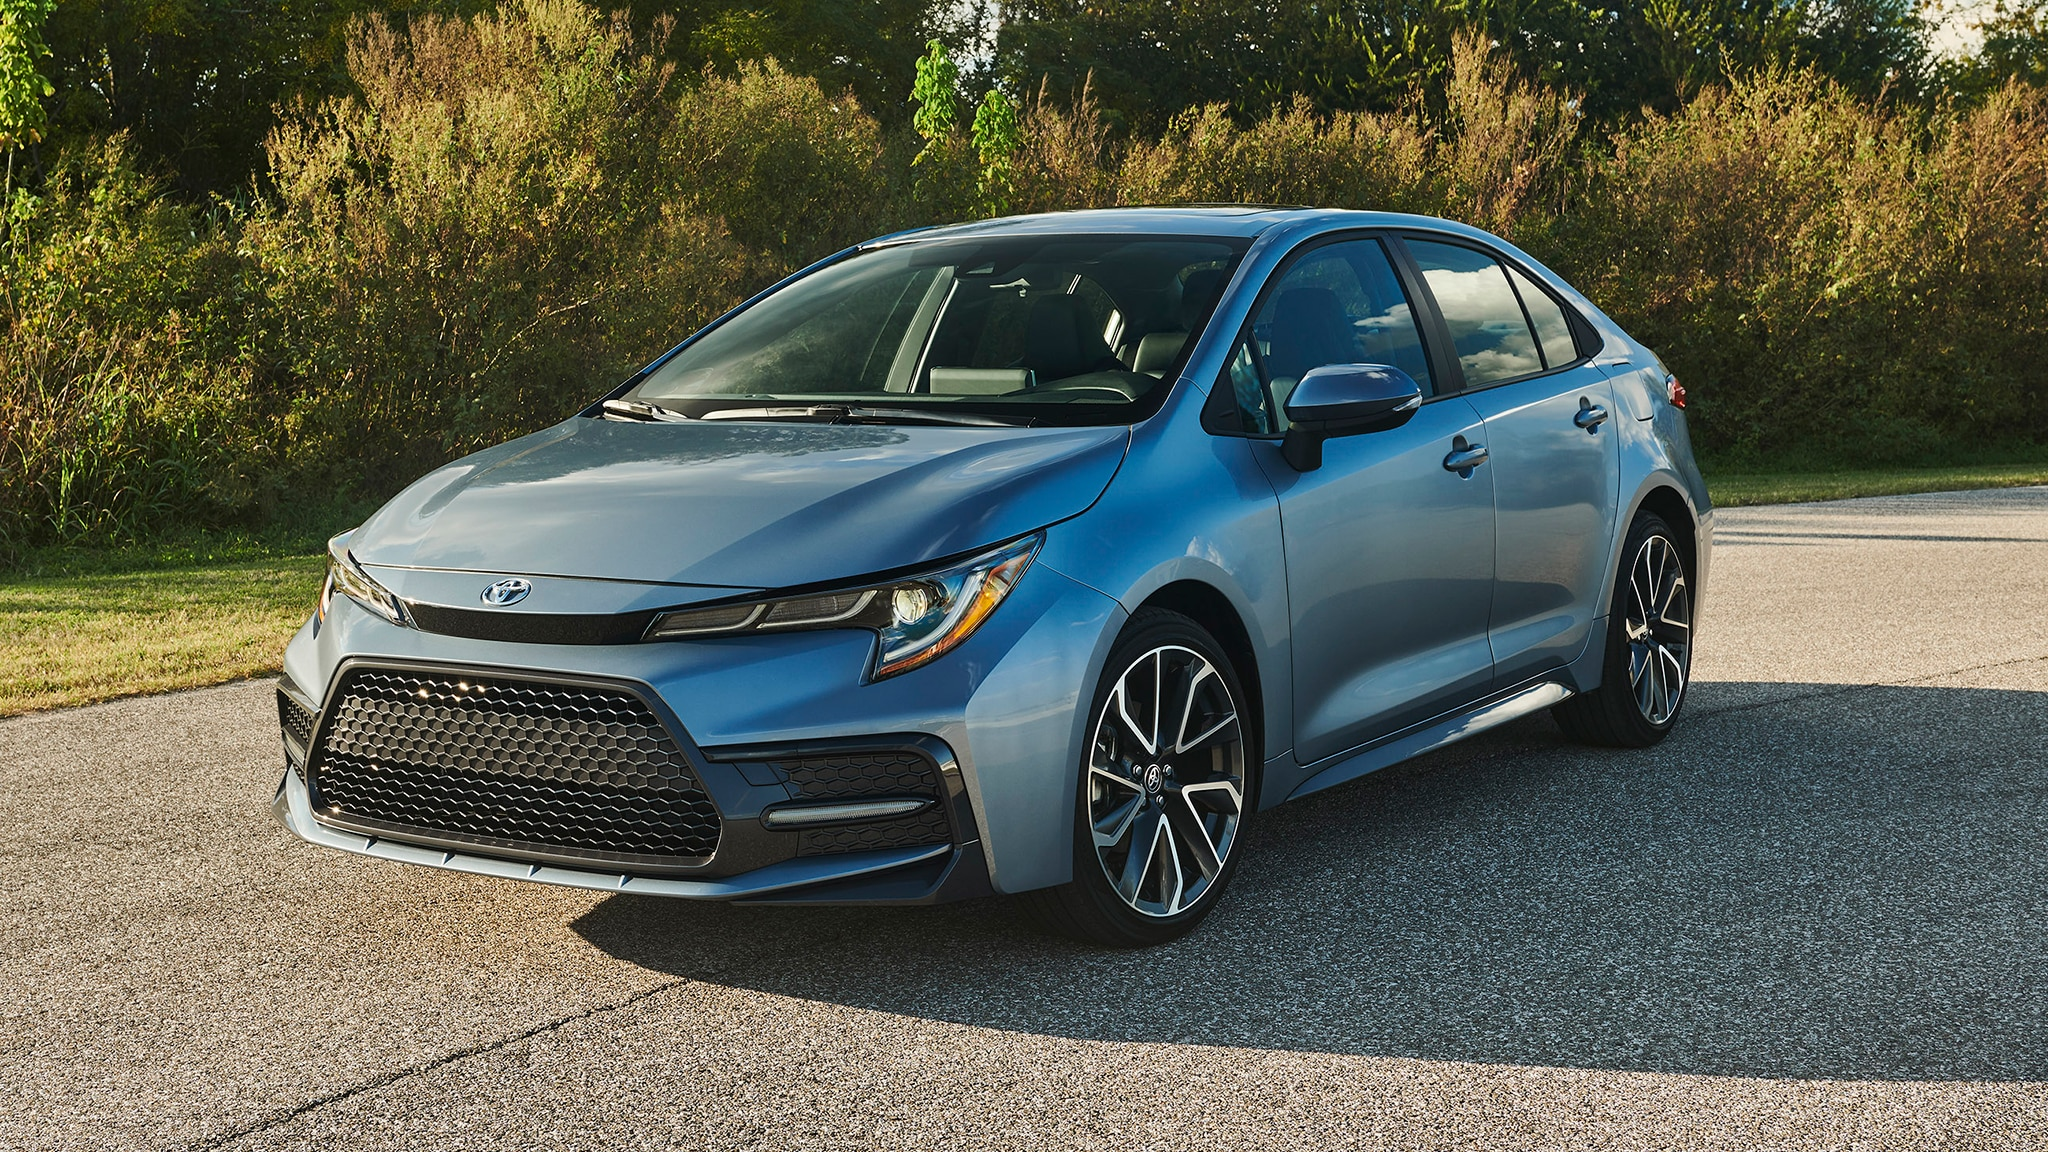 2020 Toyota Corolla Sedan is Lower, Broader, and Wider ...